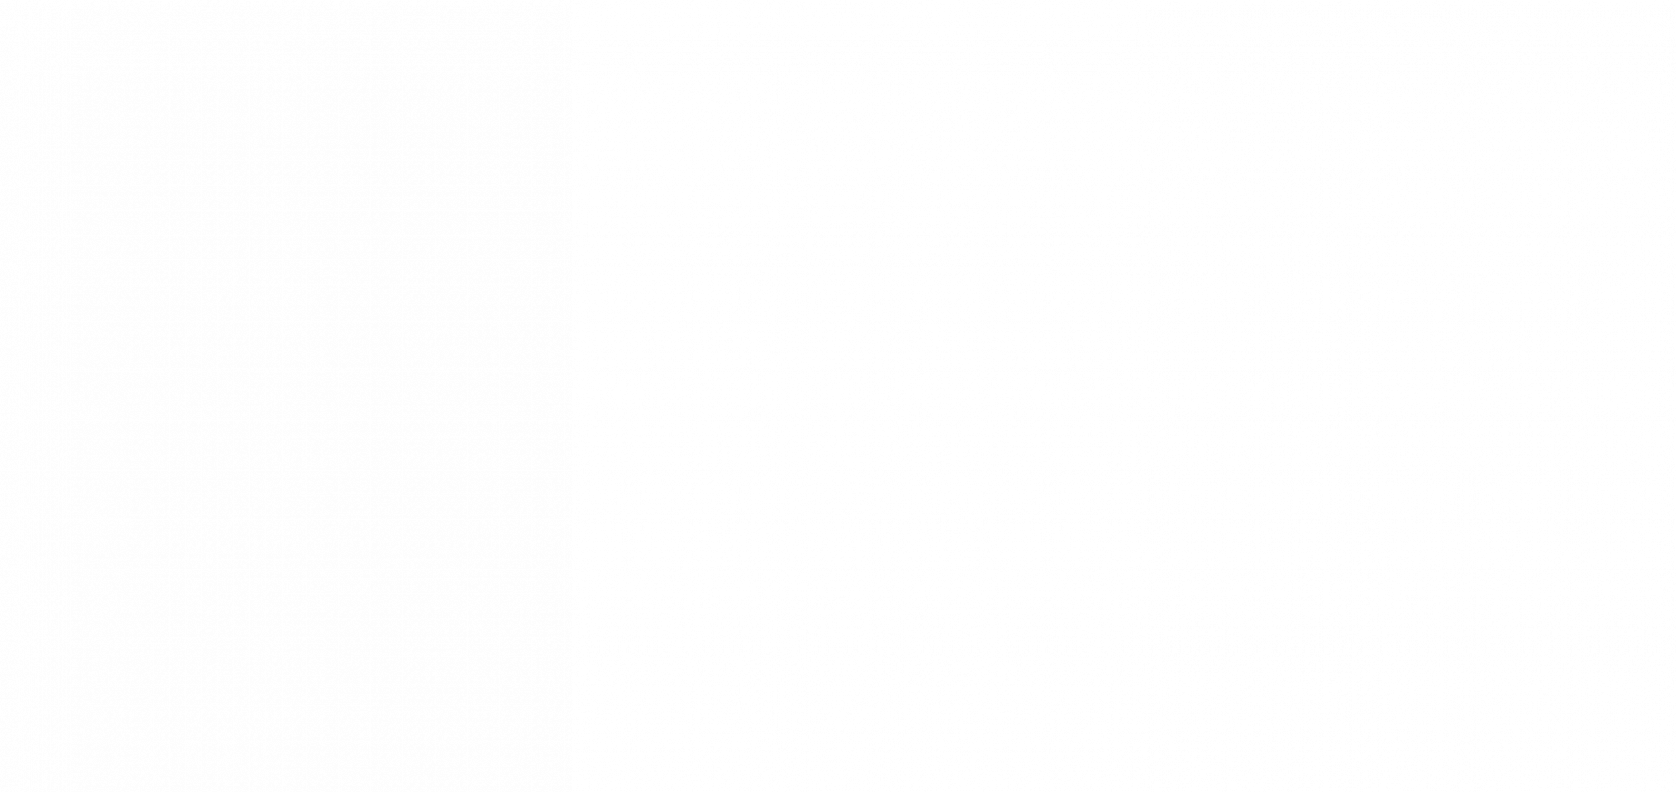 Music Video Premier